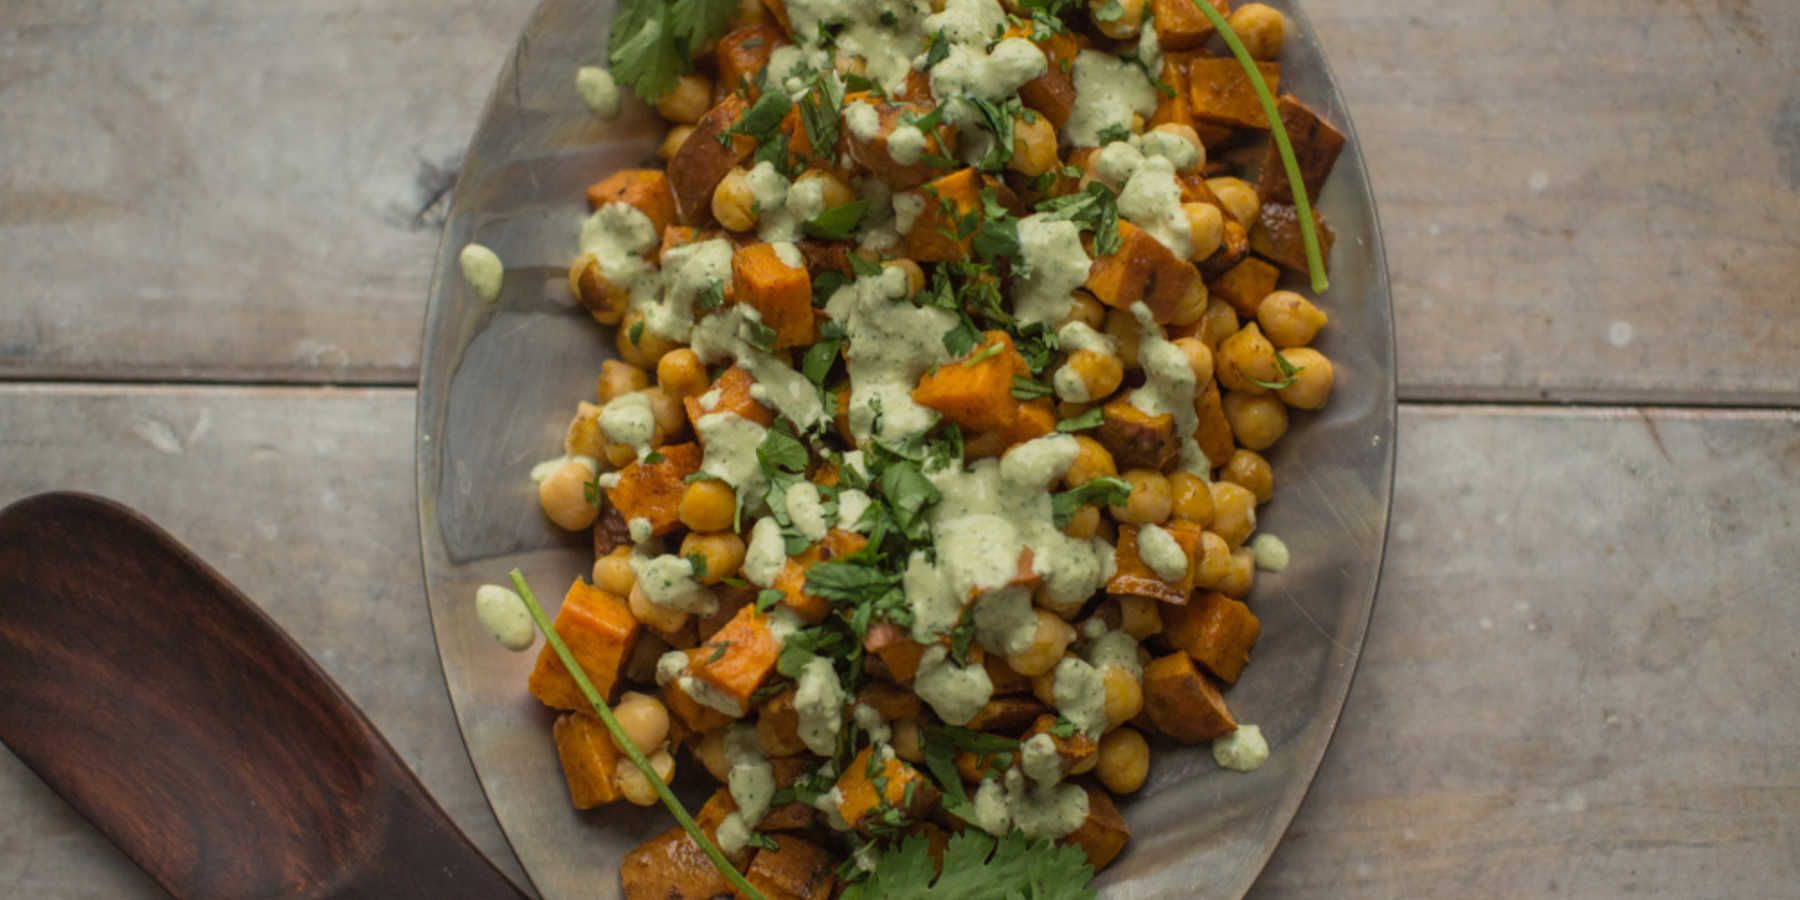 Sweet Potato-Chickpea Salad with Cilantro-Tahini Dressing - Relay Foods